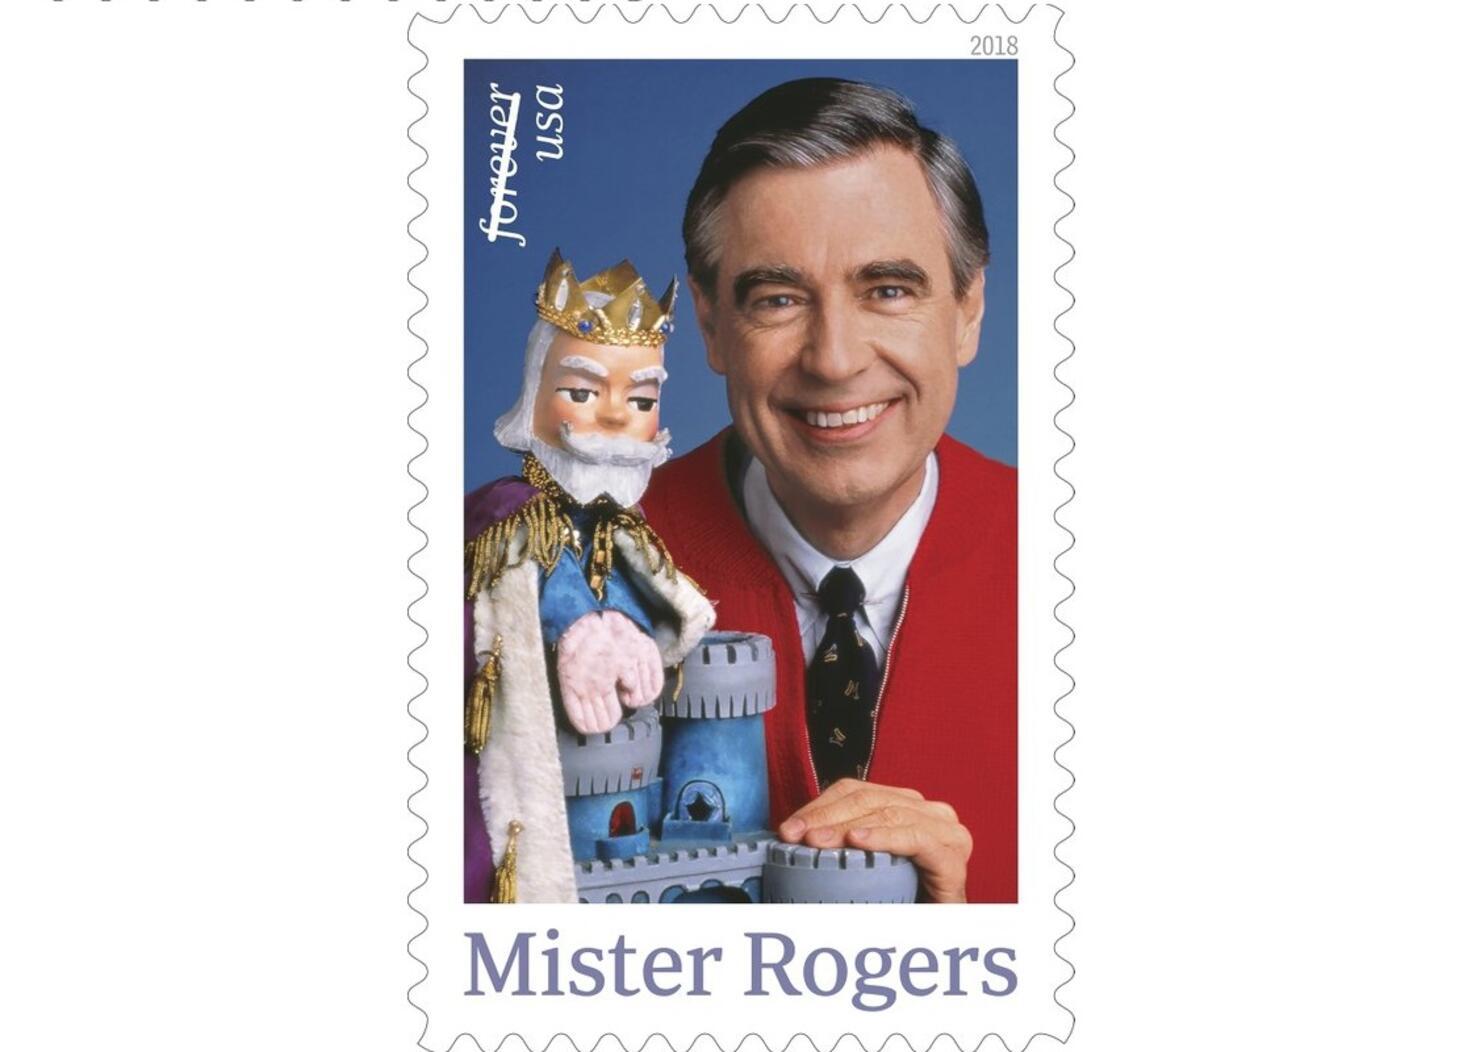 Mister Rogers Postage Stamp